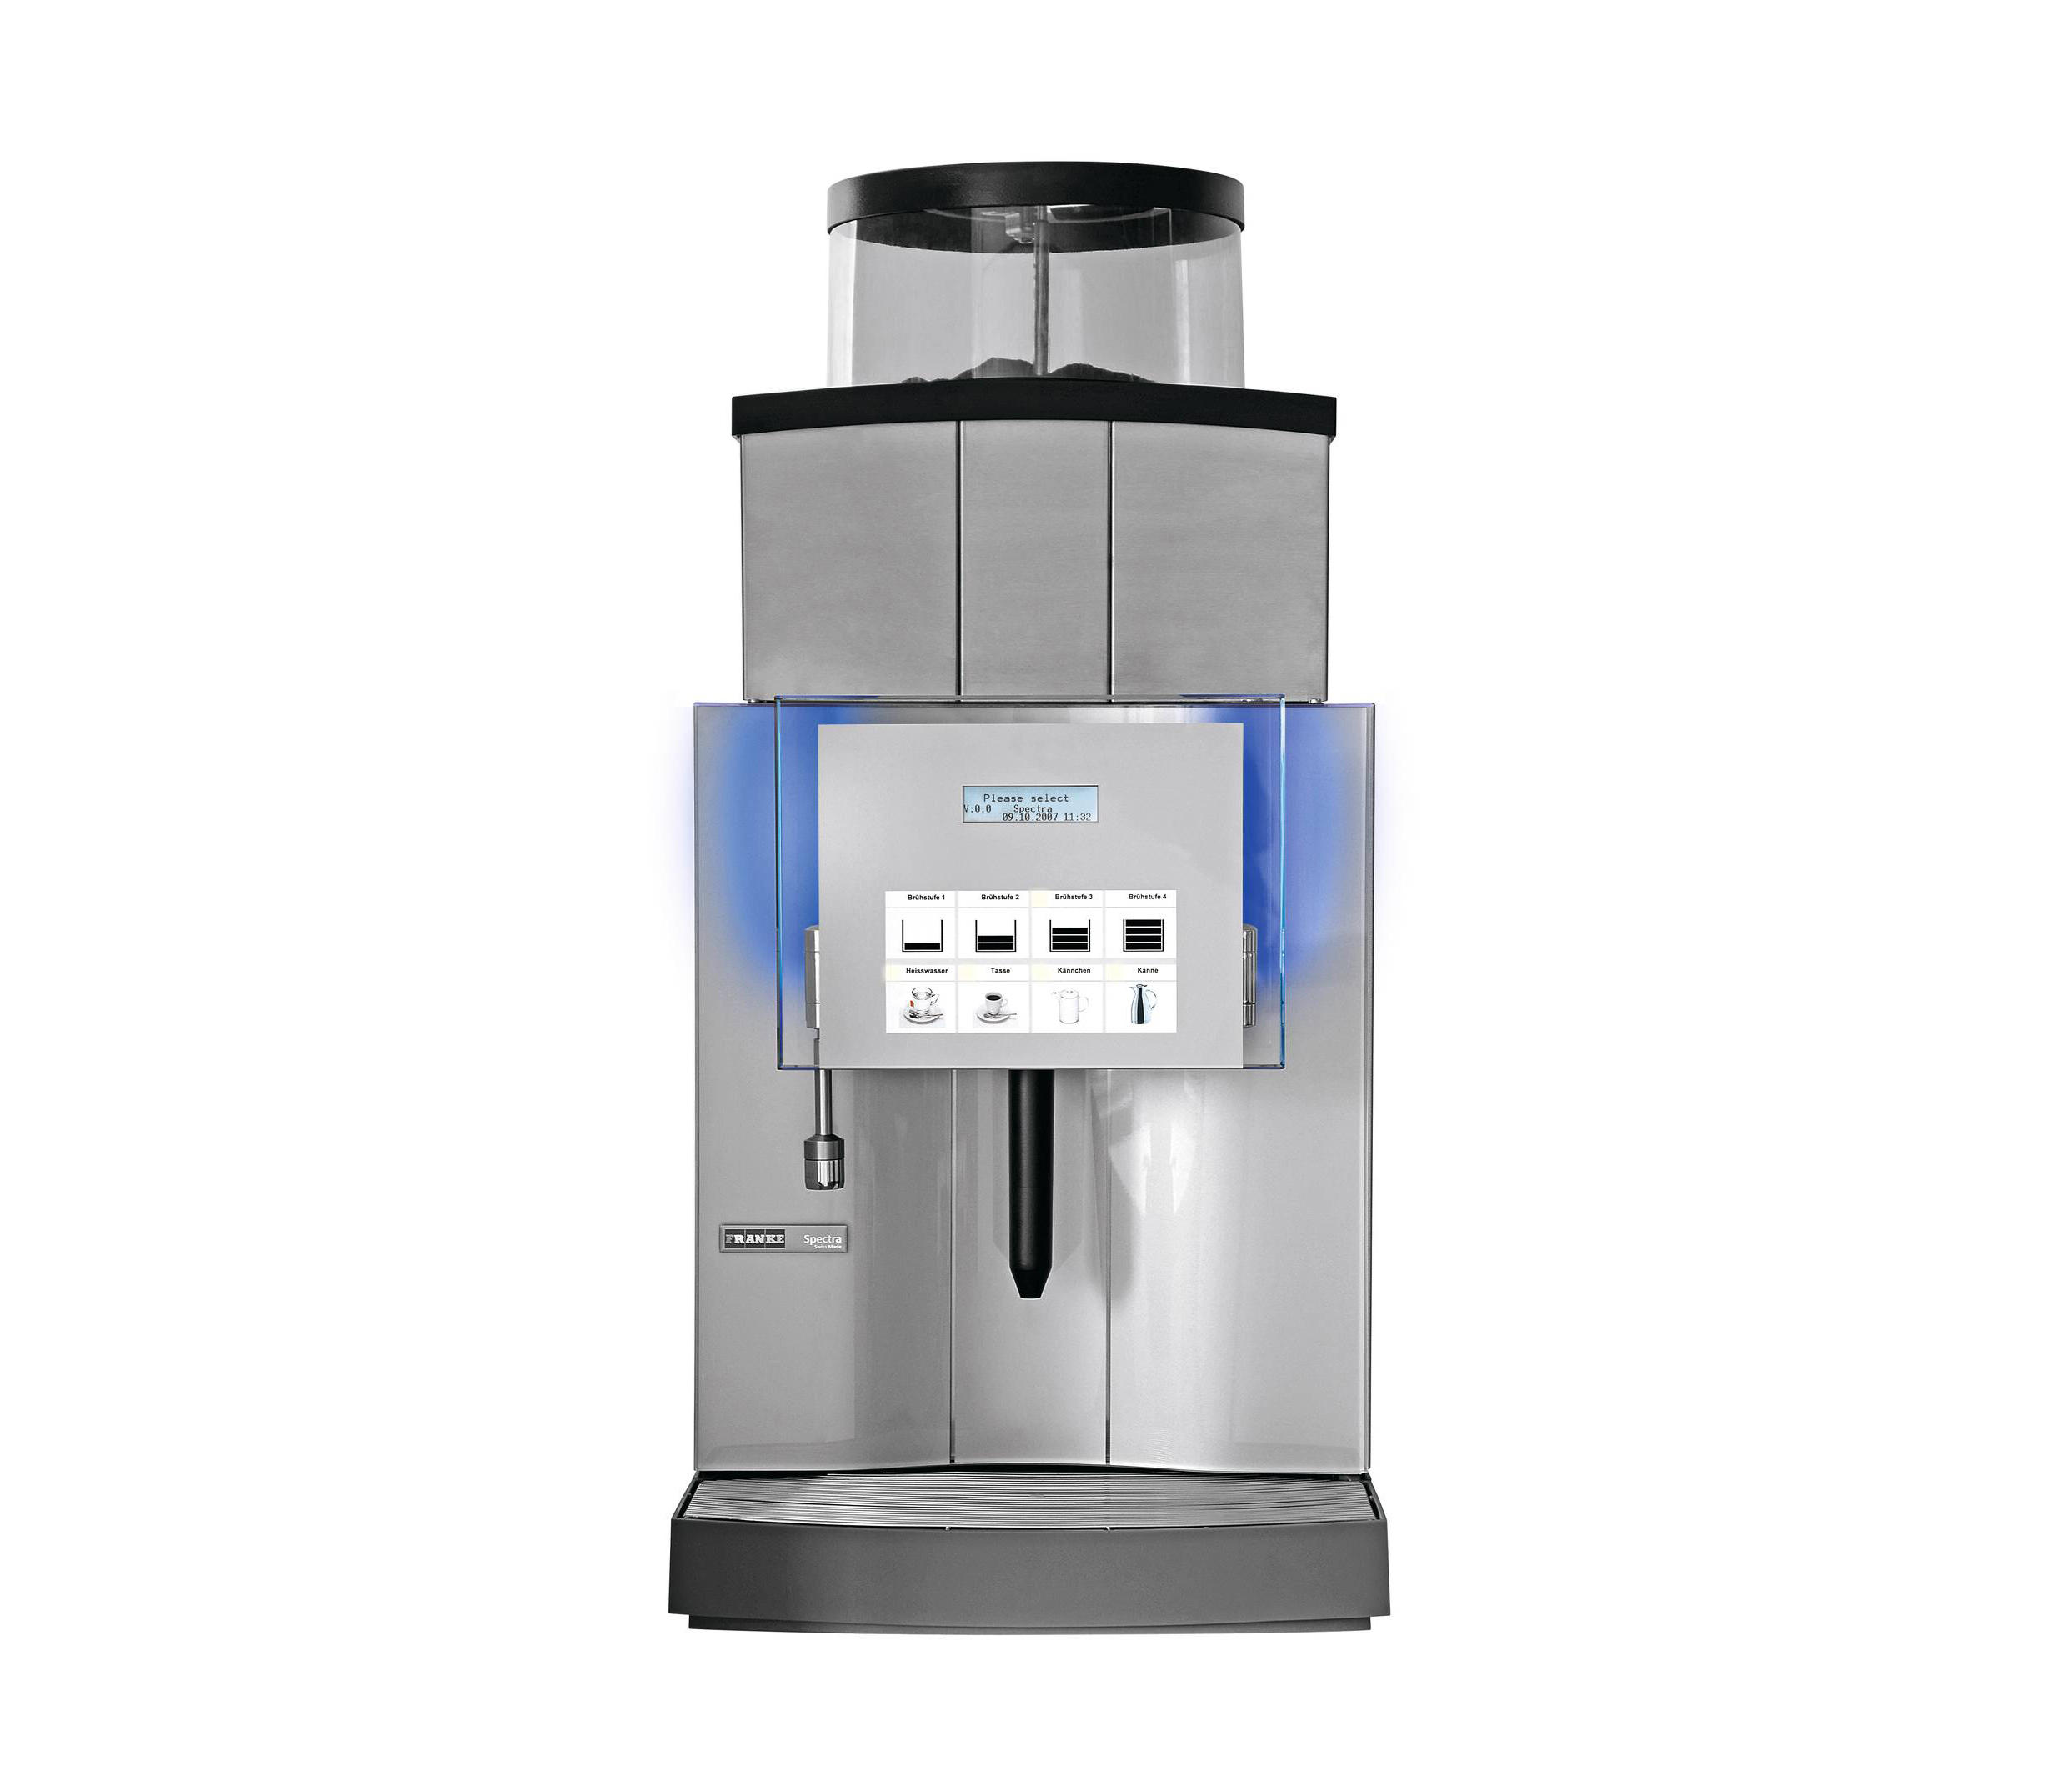 spectra x xl machines caf de franke kaffeemaschinen. Black Bedroom Furniture Sets. Home Design Ideas